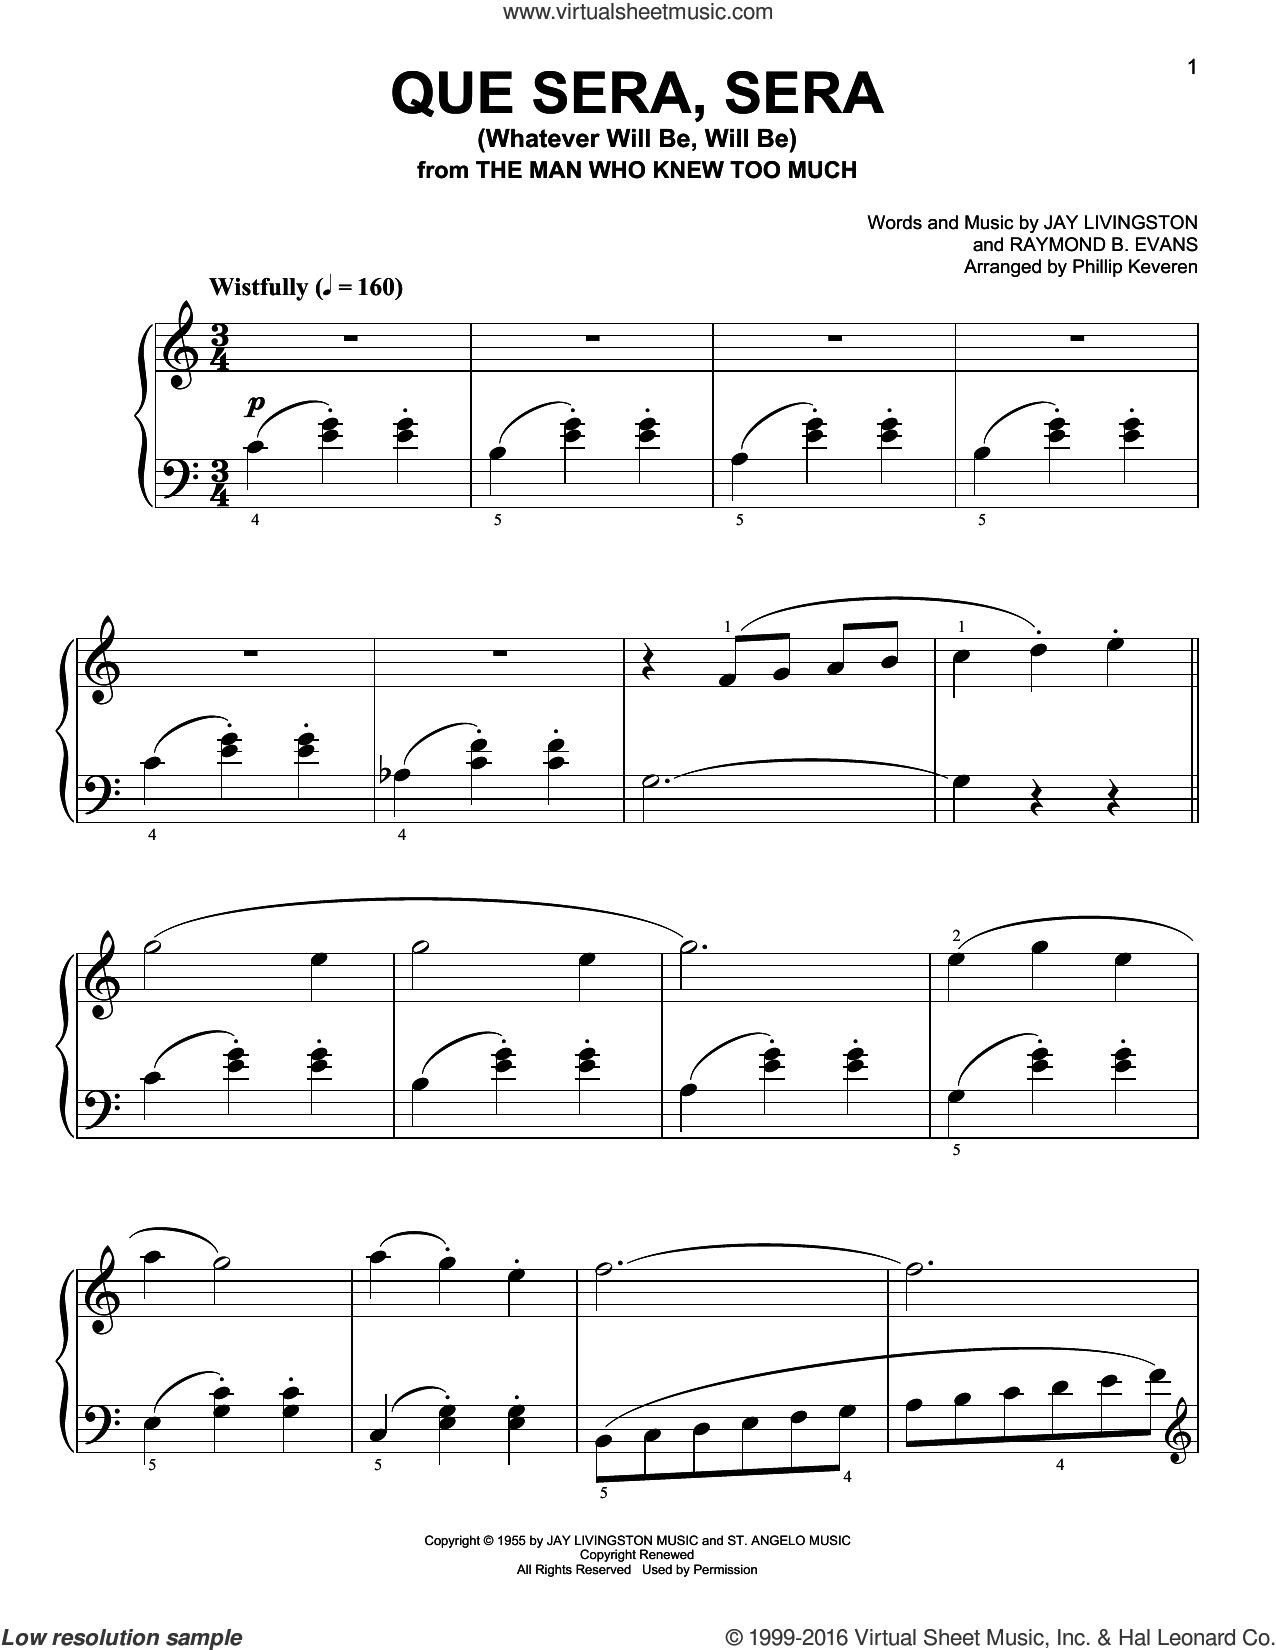 Que Sera, Sera (Whatever Will Be, Will Be) (arr. Phillip Keveren) sheet music for piano solo by Jay Livingston, Phillip Keveren, Doris Day and Raymond B. Evans, easy skill level